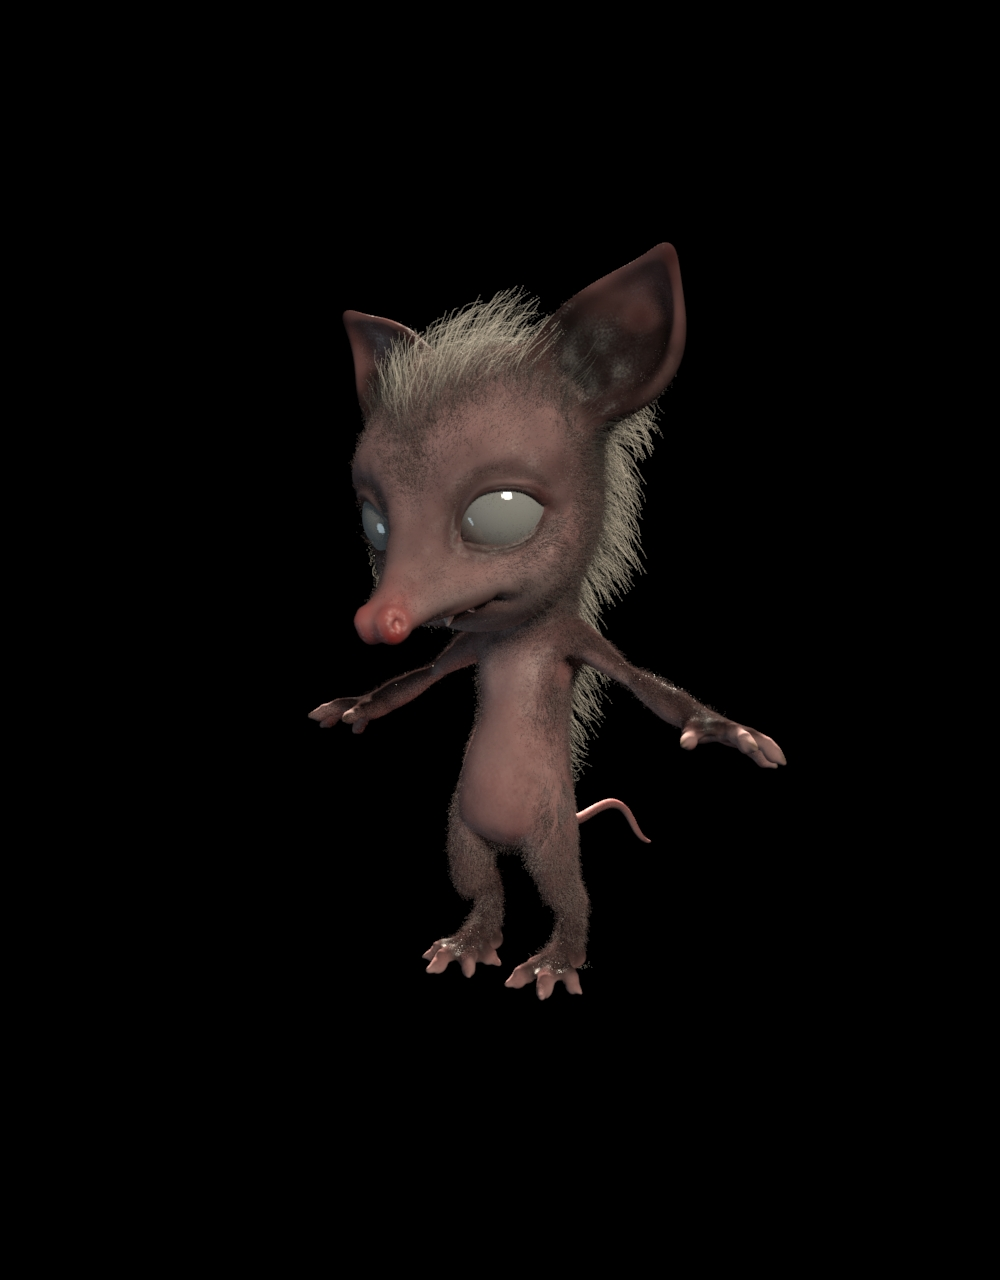 OpossumTest